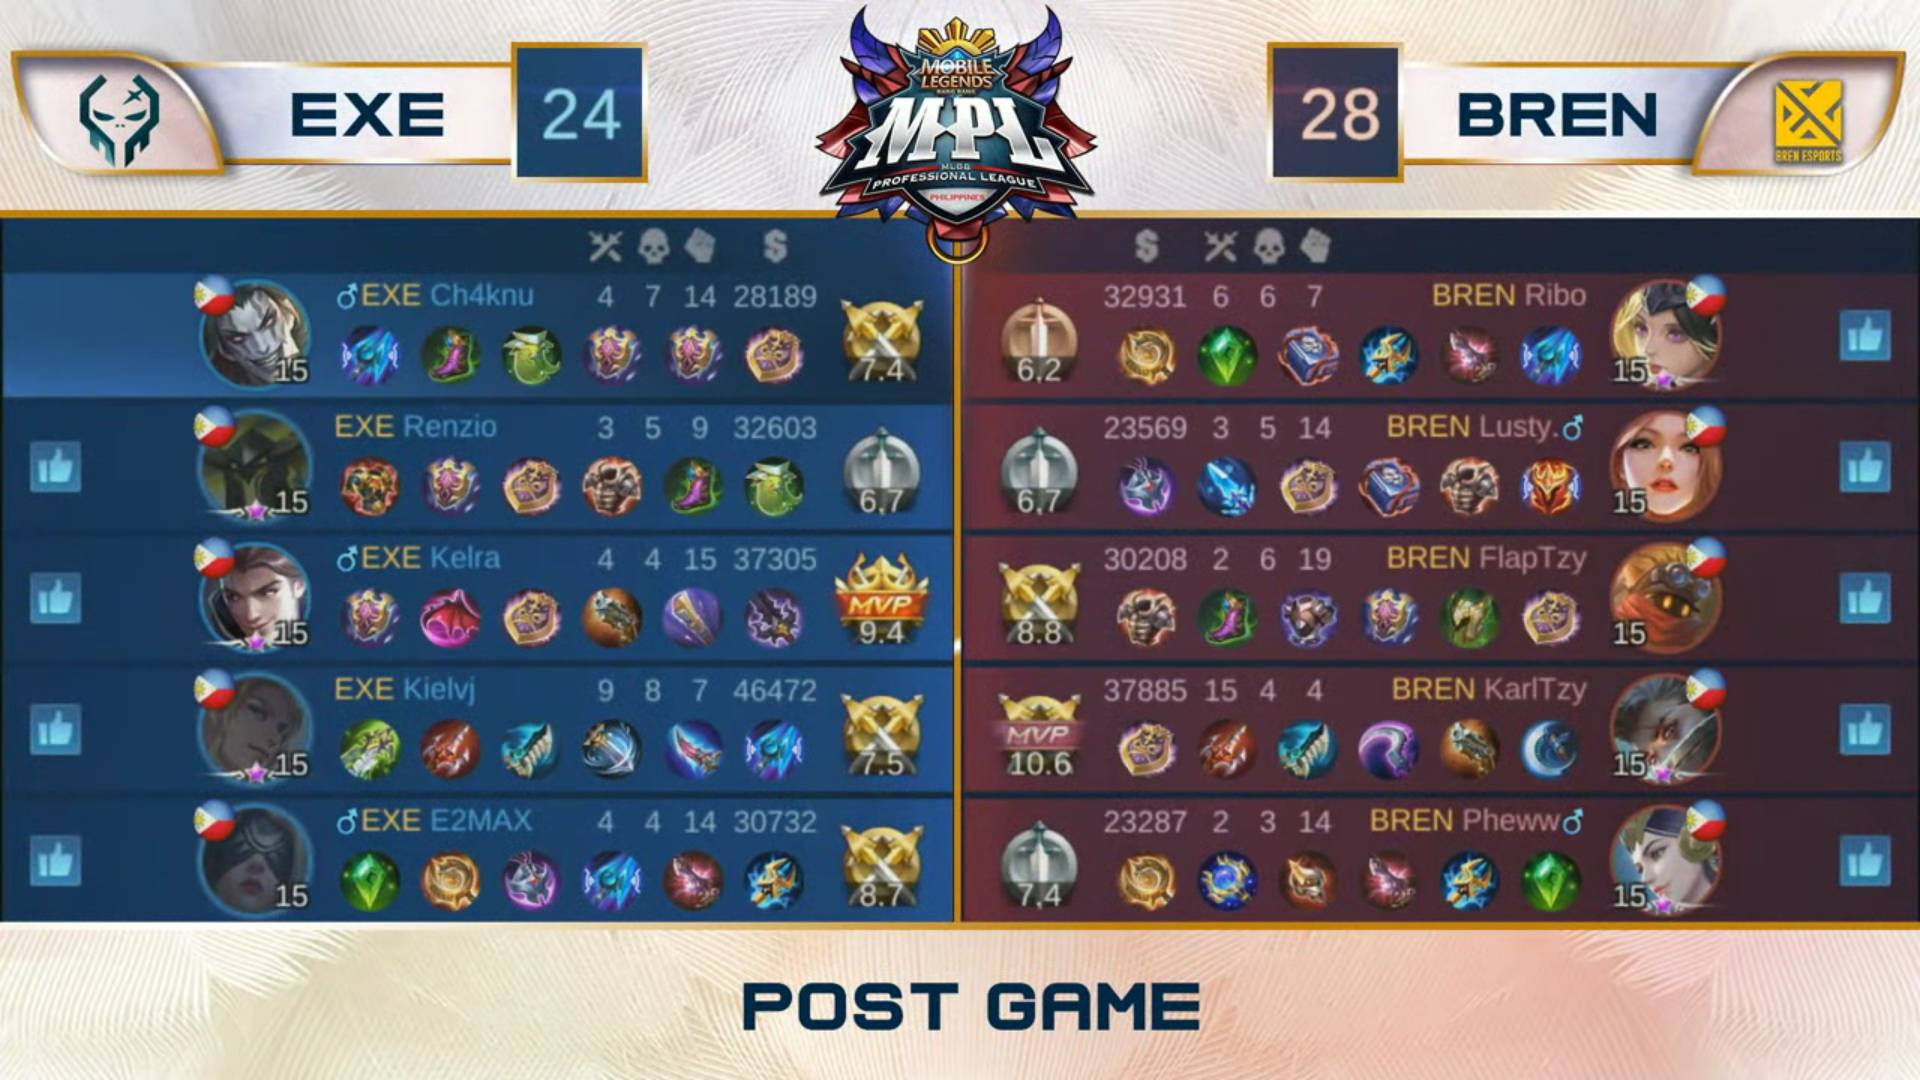 MPL-PH-Season-7-Lower-Bracket-Execration-def-BREN-Game-3 Execration dethrones MPL PH kings Bren ESports Mobile Legends MPL-PH News  - philippine sports news